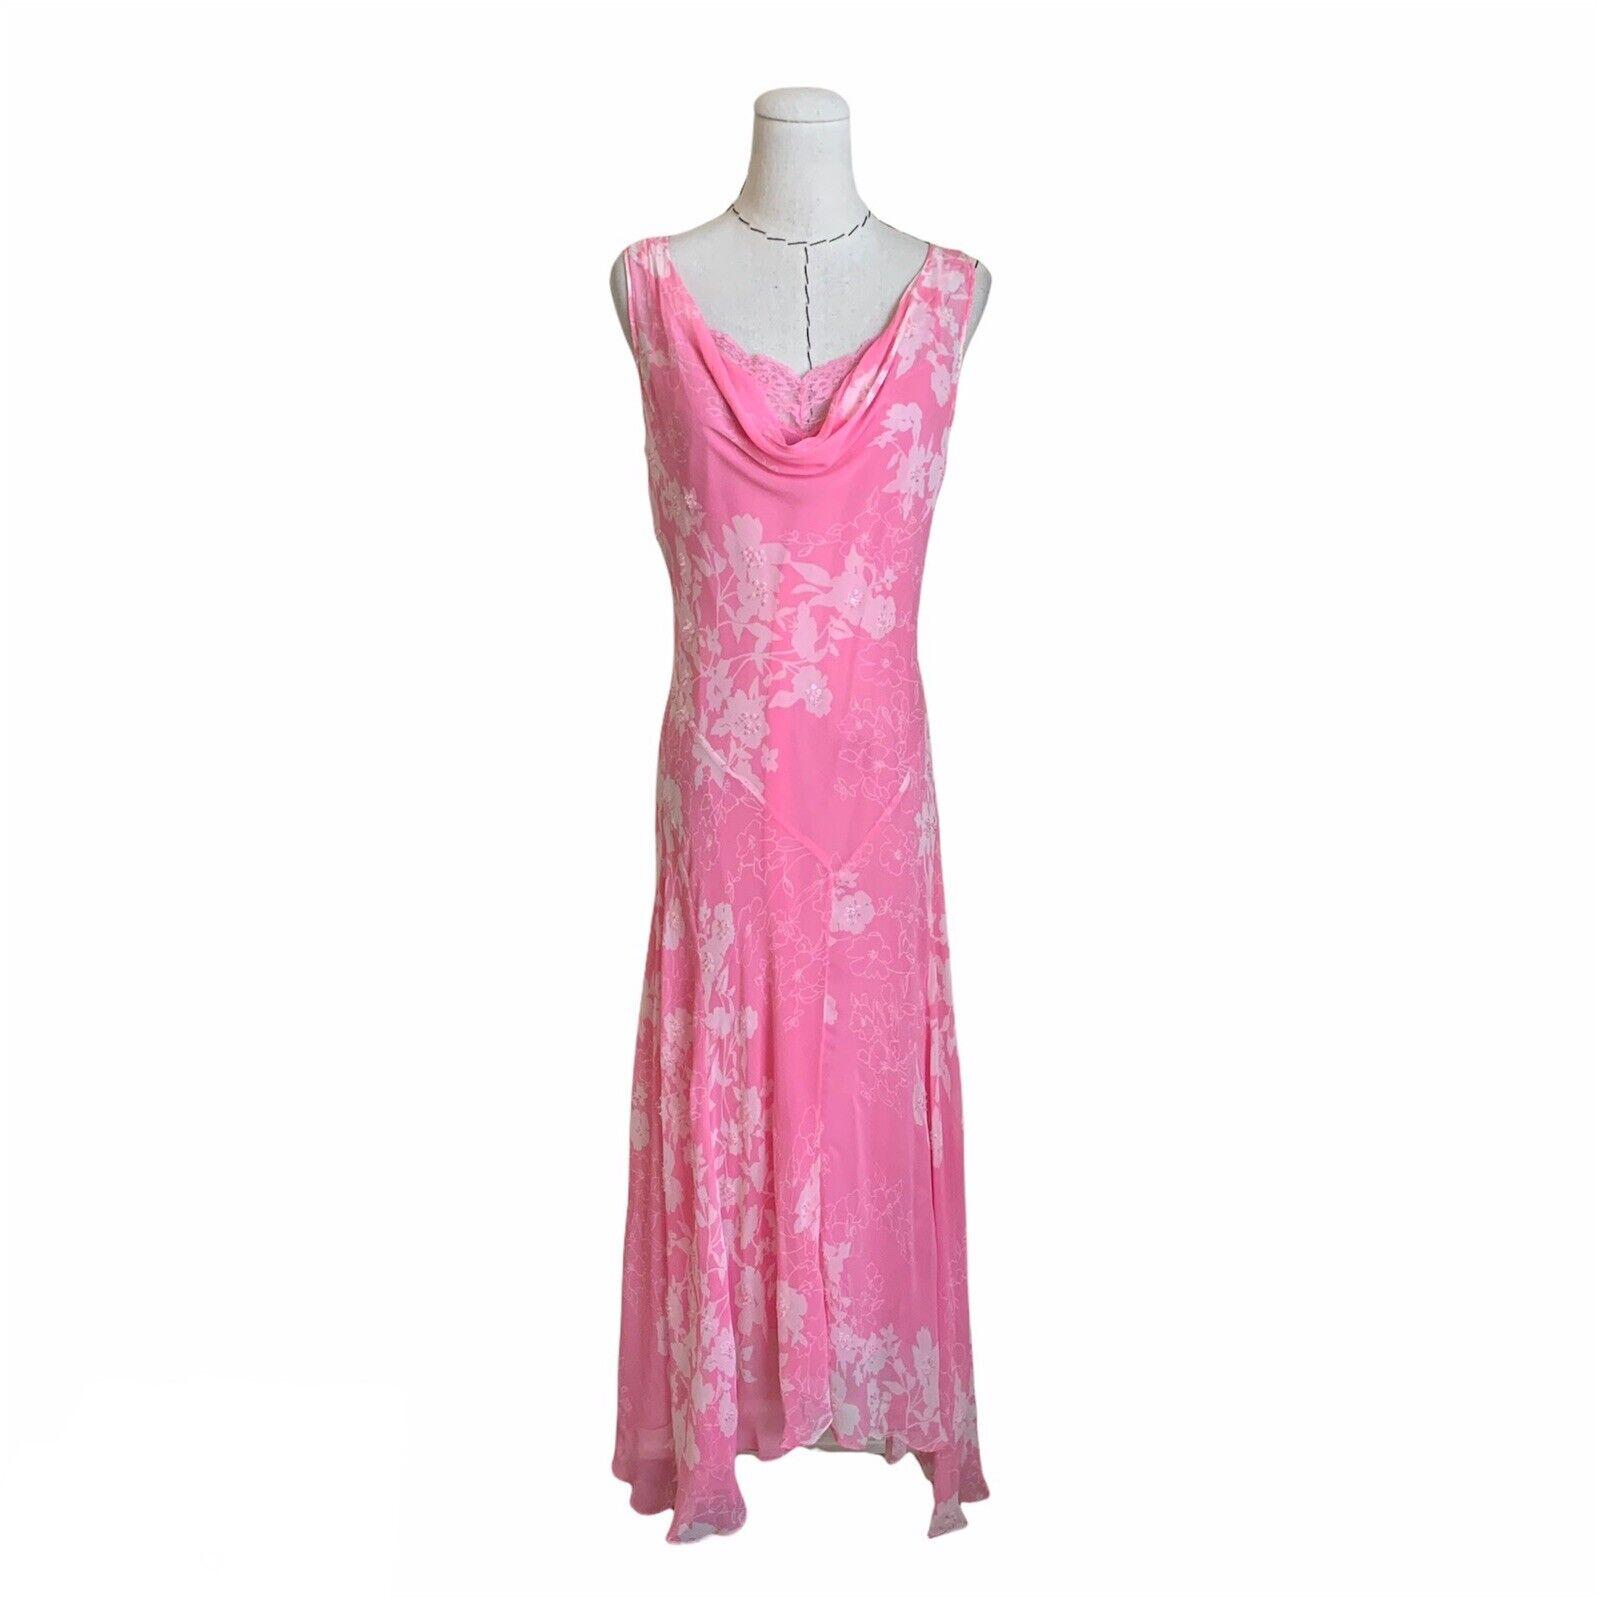 Vintage 90s Y2K Pink Silk Chiffon Bias Cut Slip D… - image 1